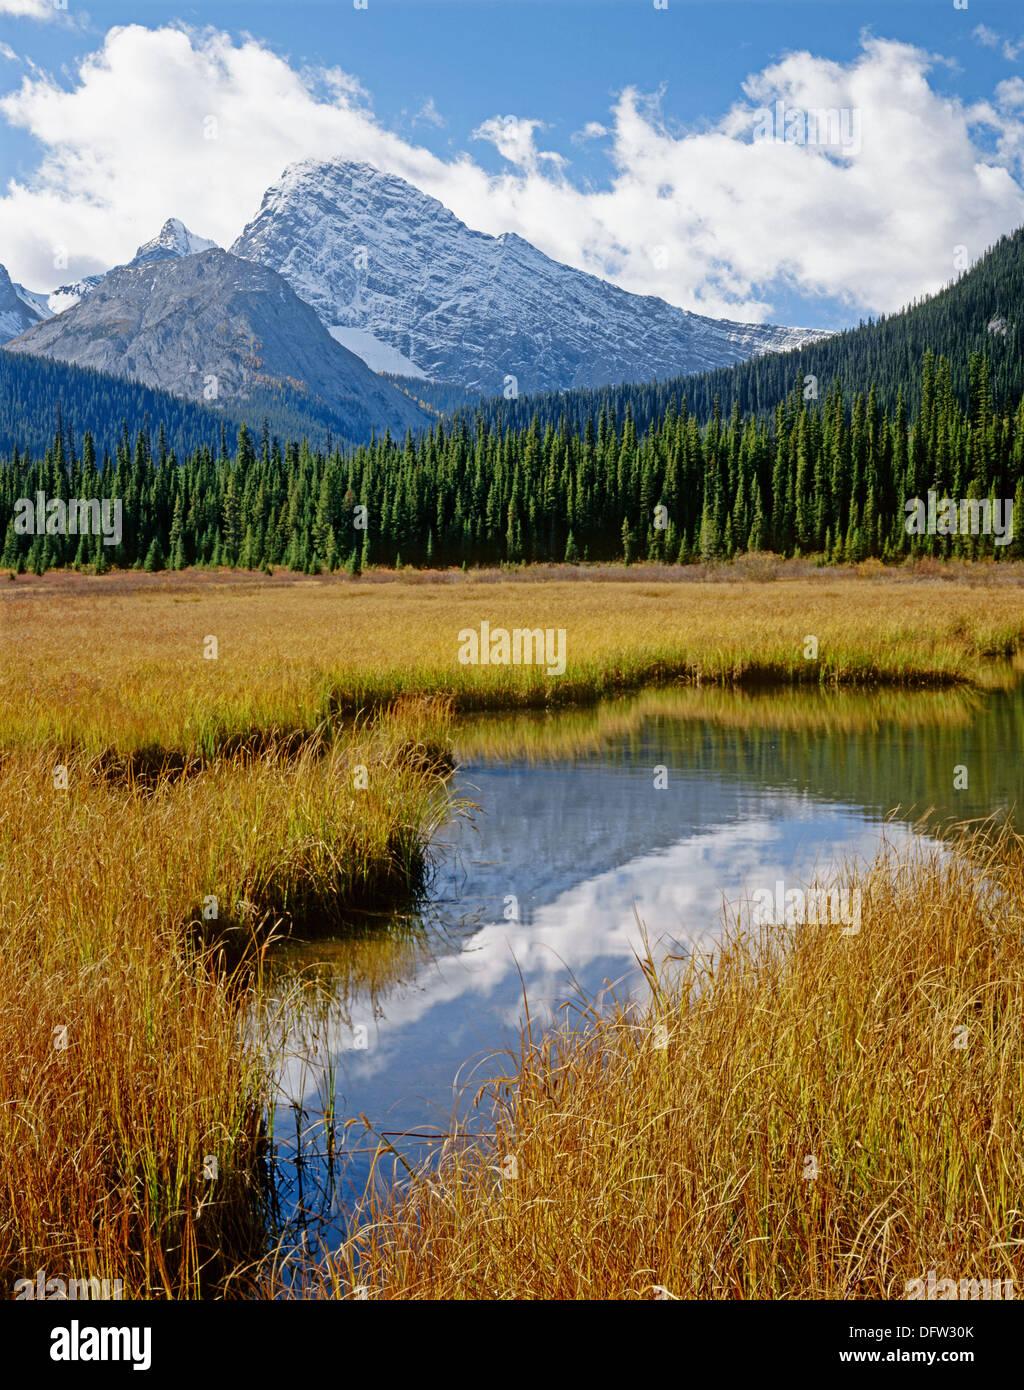 Commonwealth Peak from wetlands of Smuts Creek. Kananaskis Country, Alberta, Canada - Stock Image